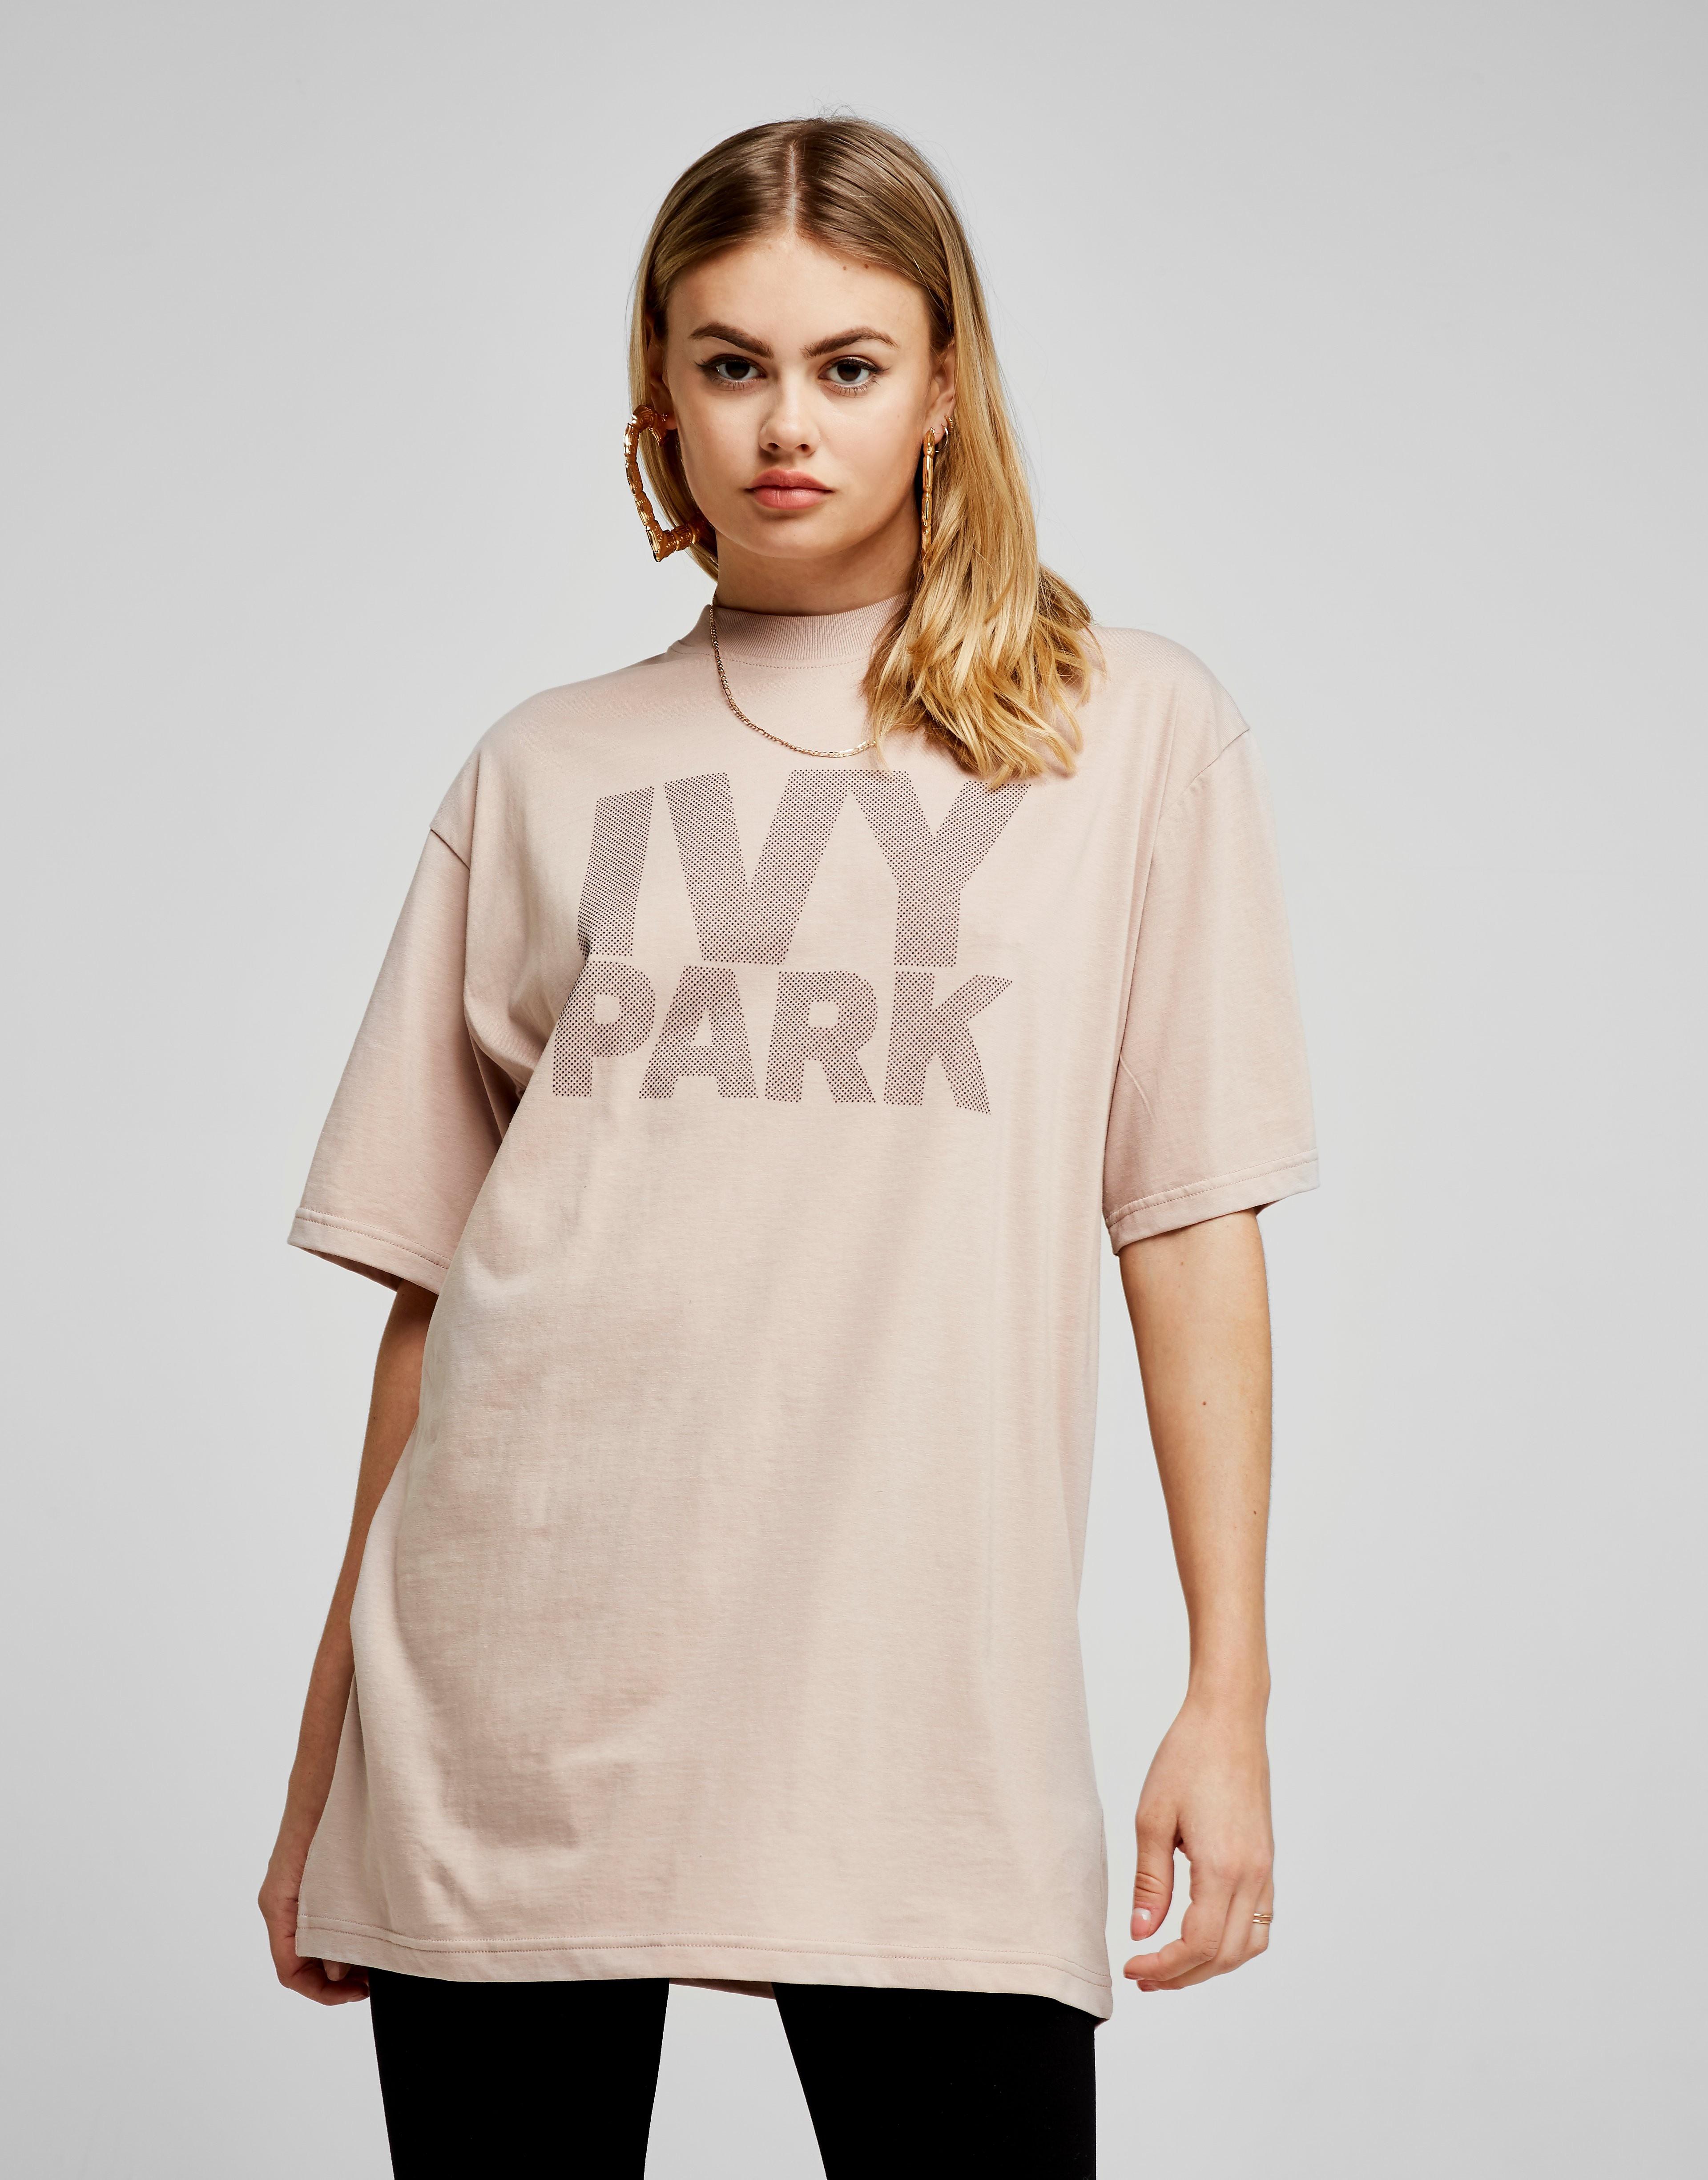 IVY PARK Dotted Logo Boyfriend T-Shirt